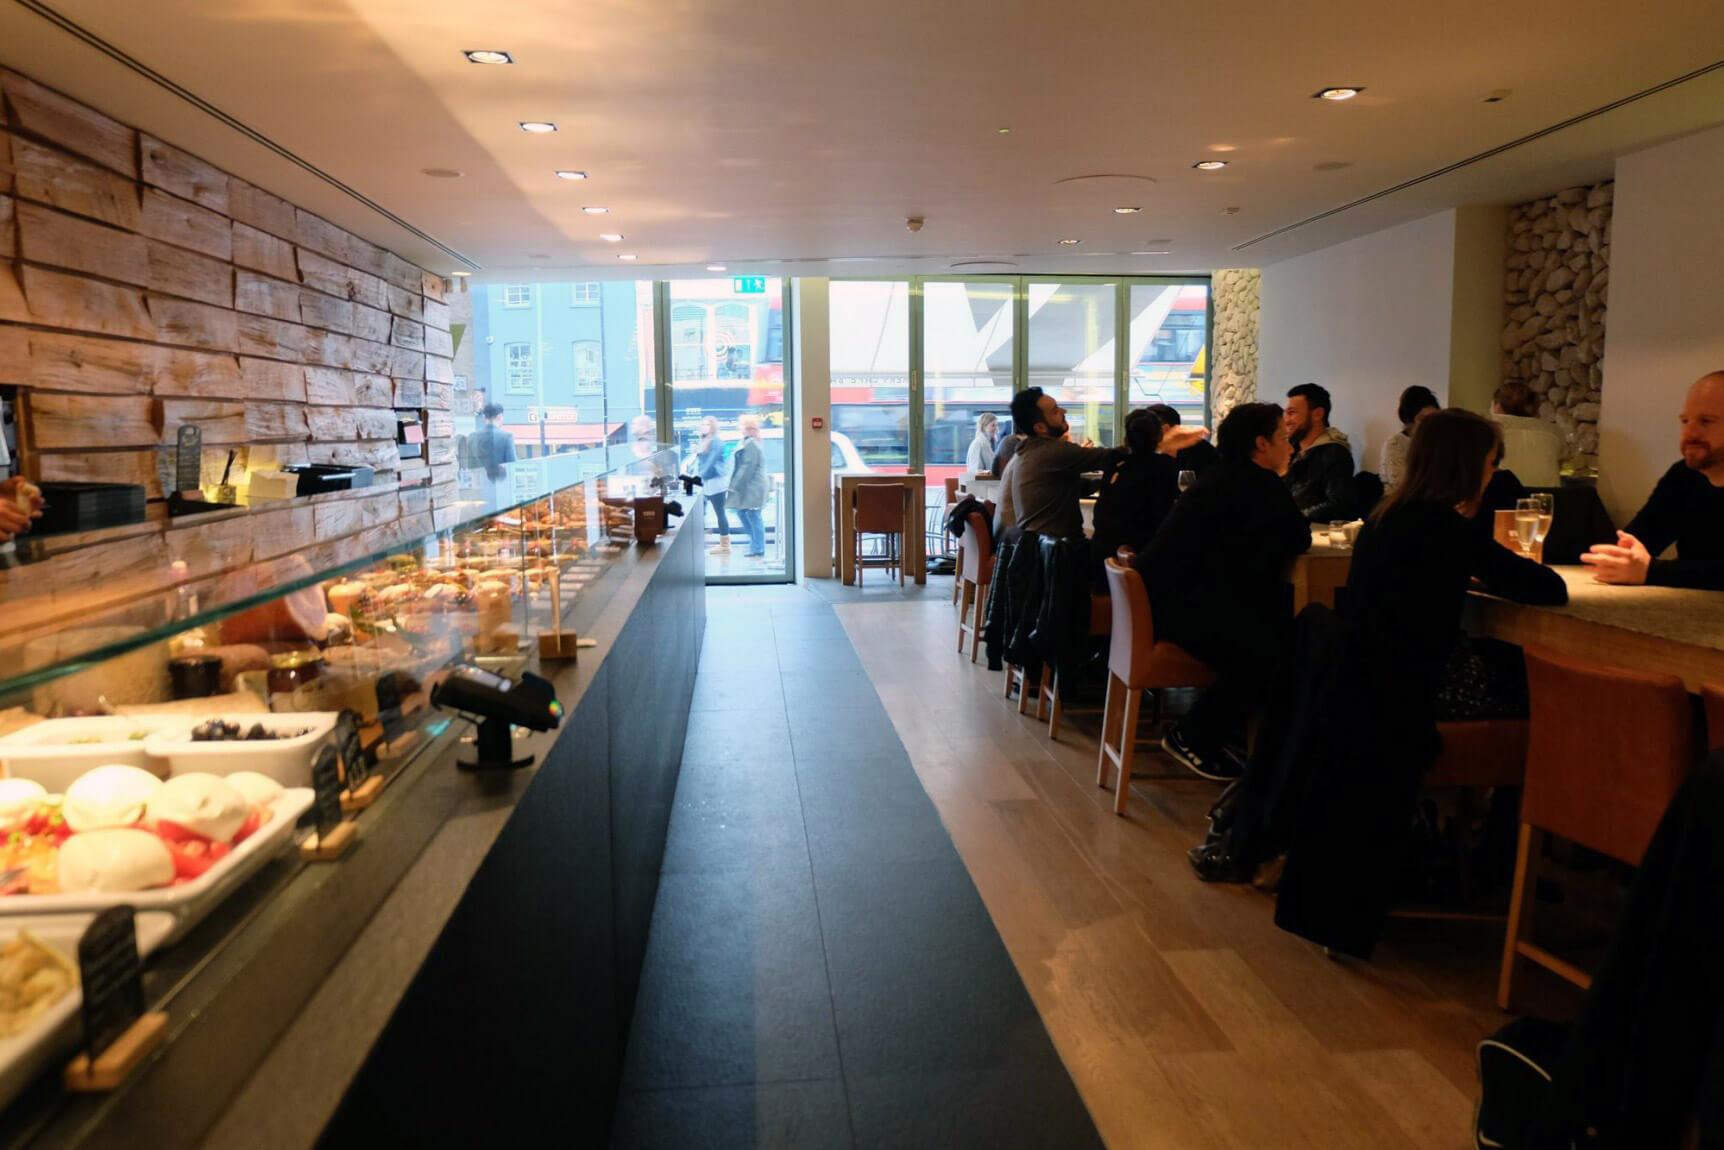 vivo taste, islington, italian, upper street, trattoria, rooftop, traditional, food, restaurant, review, new opening, new, london, top, best, healthy, sharing, yummy, fresh, chocolate, tart